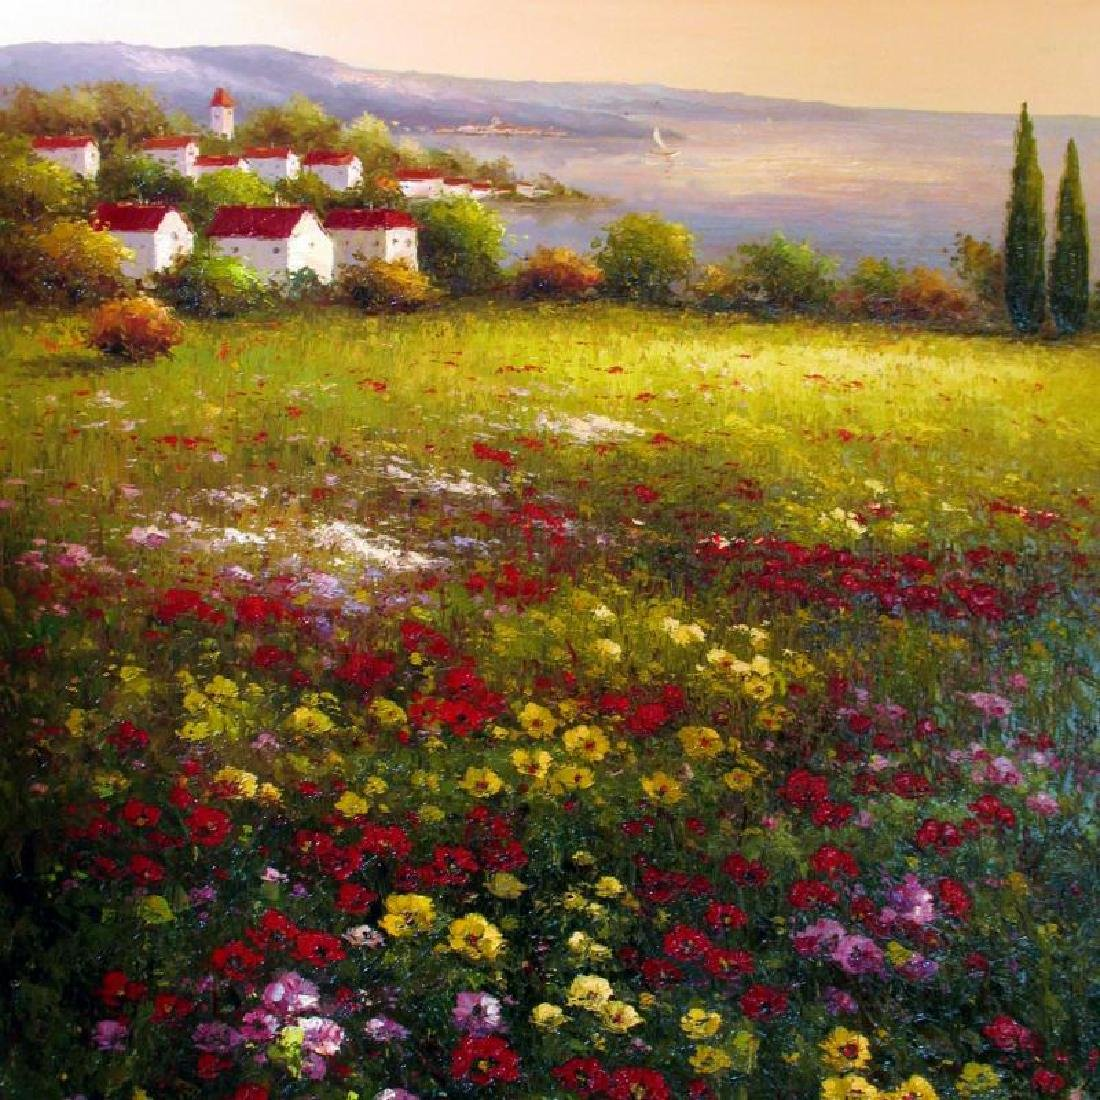 Floral Colorful Original Painting Dealer SALE Landscape - 2